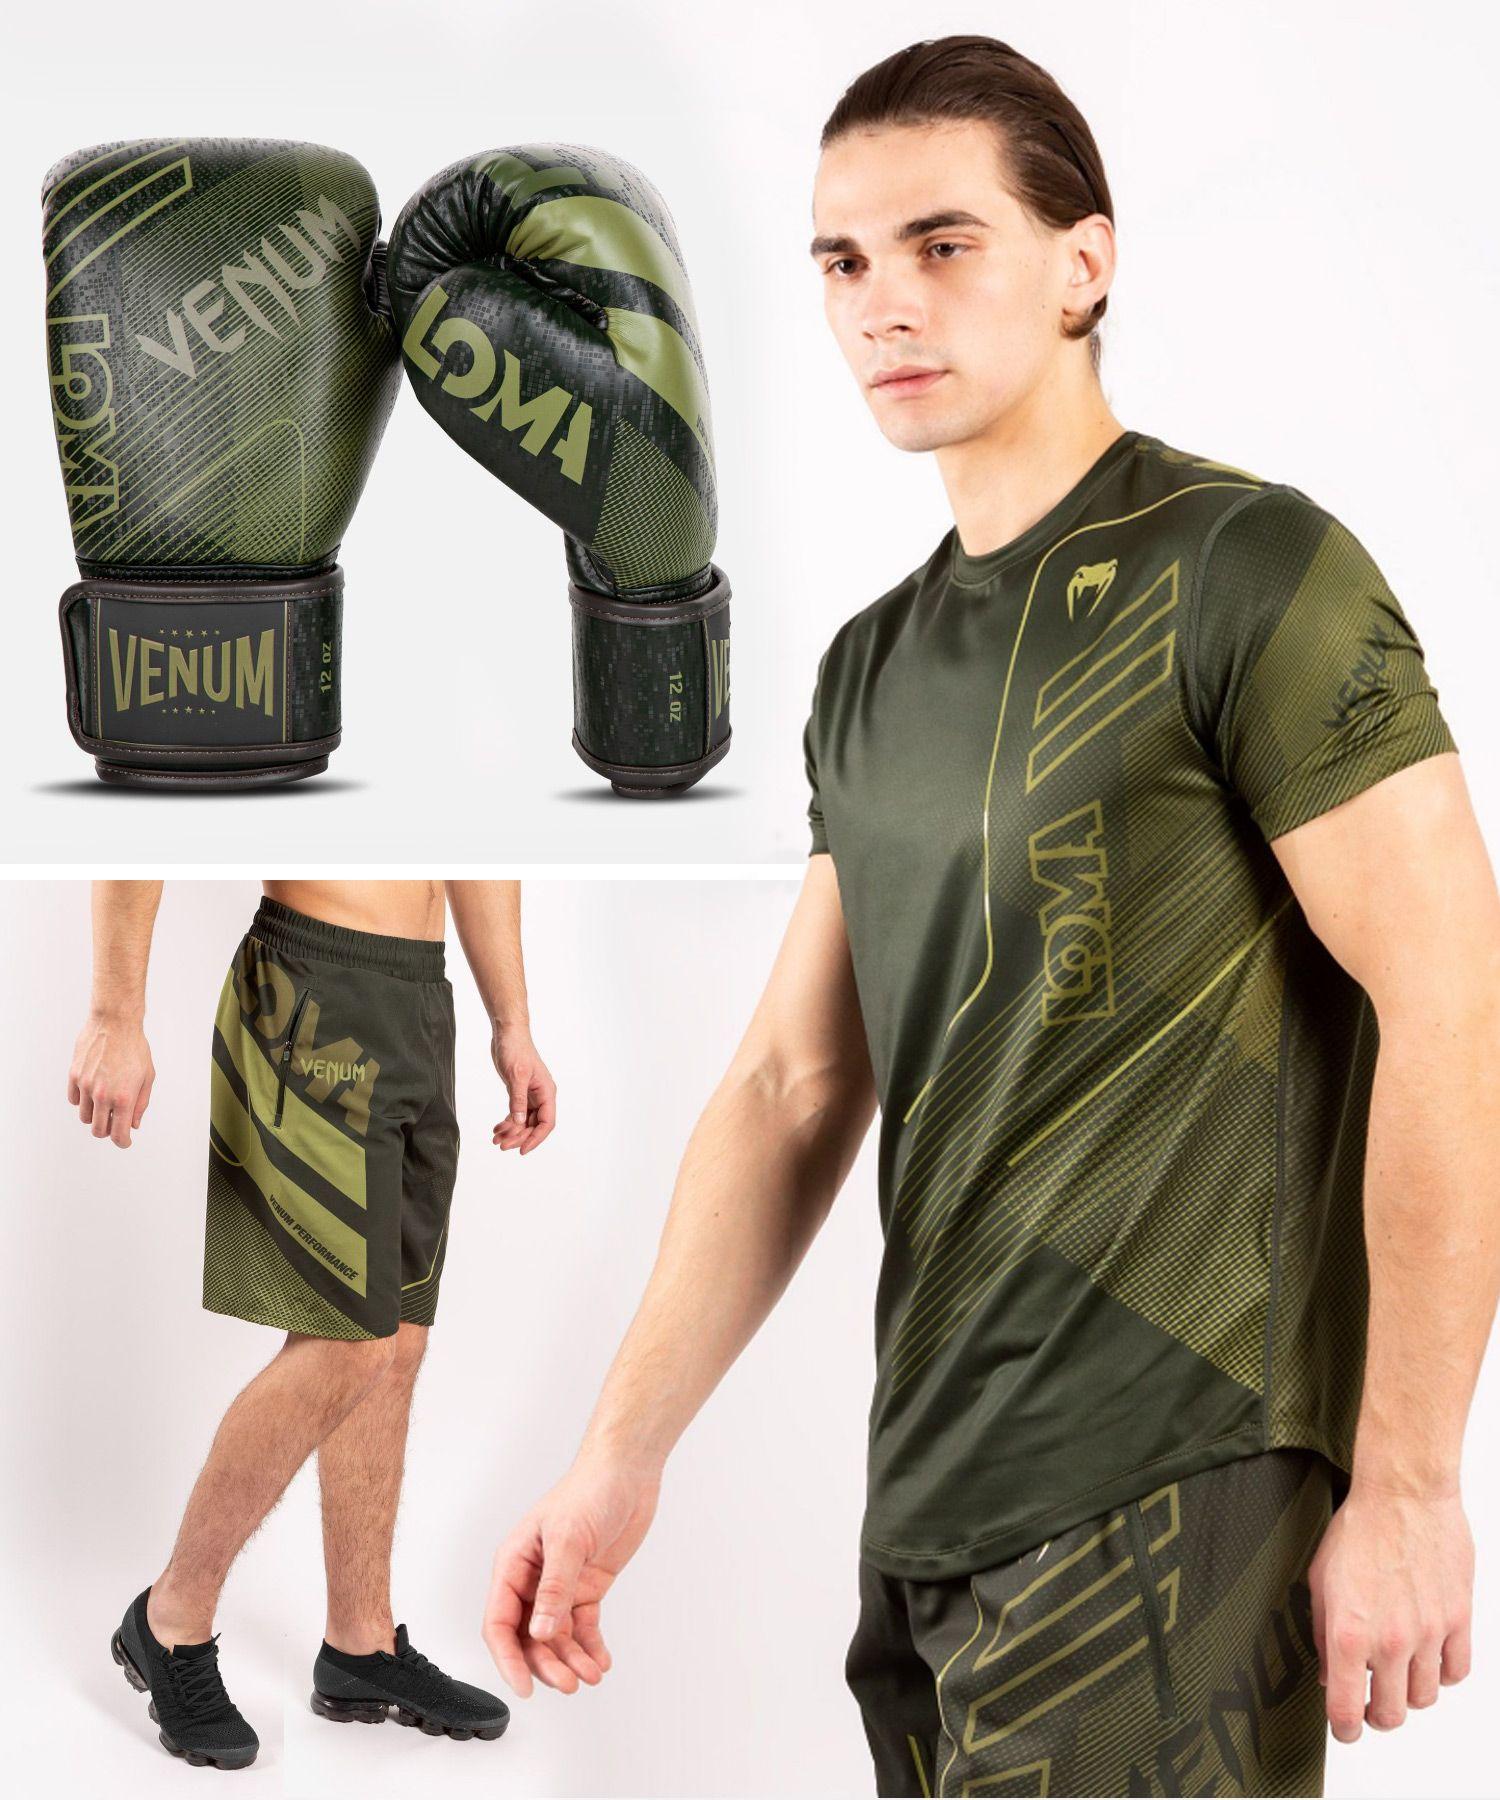 Loma Commando Technical Pack 3